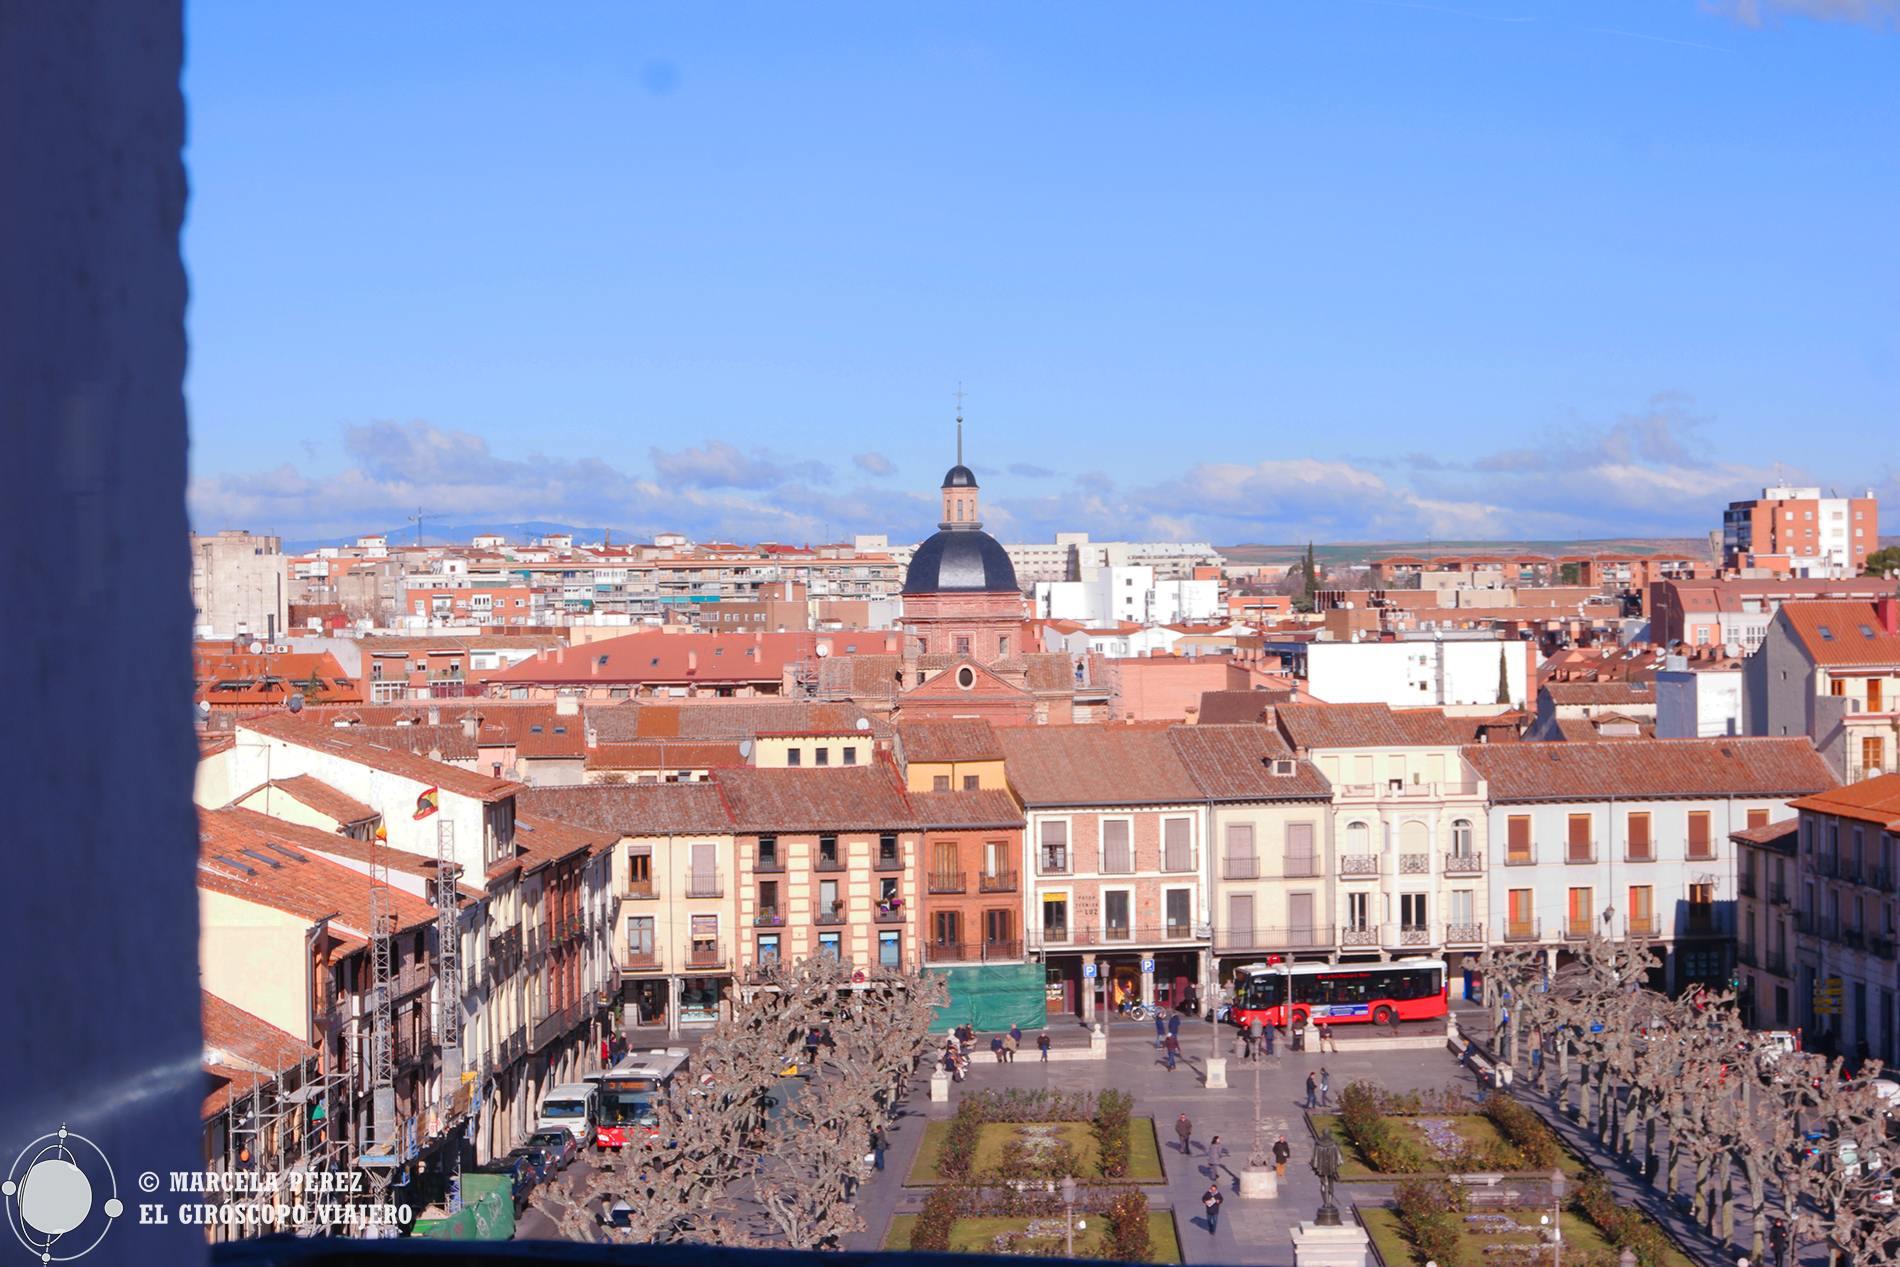 Vista de la Plaza de Cervantes desde la torre